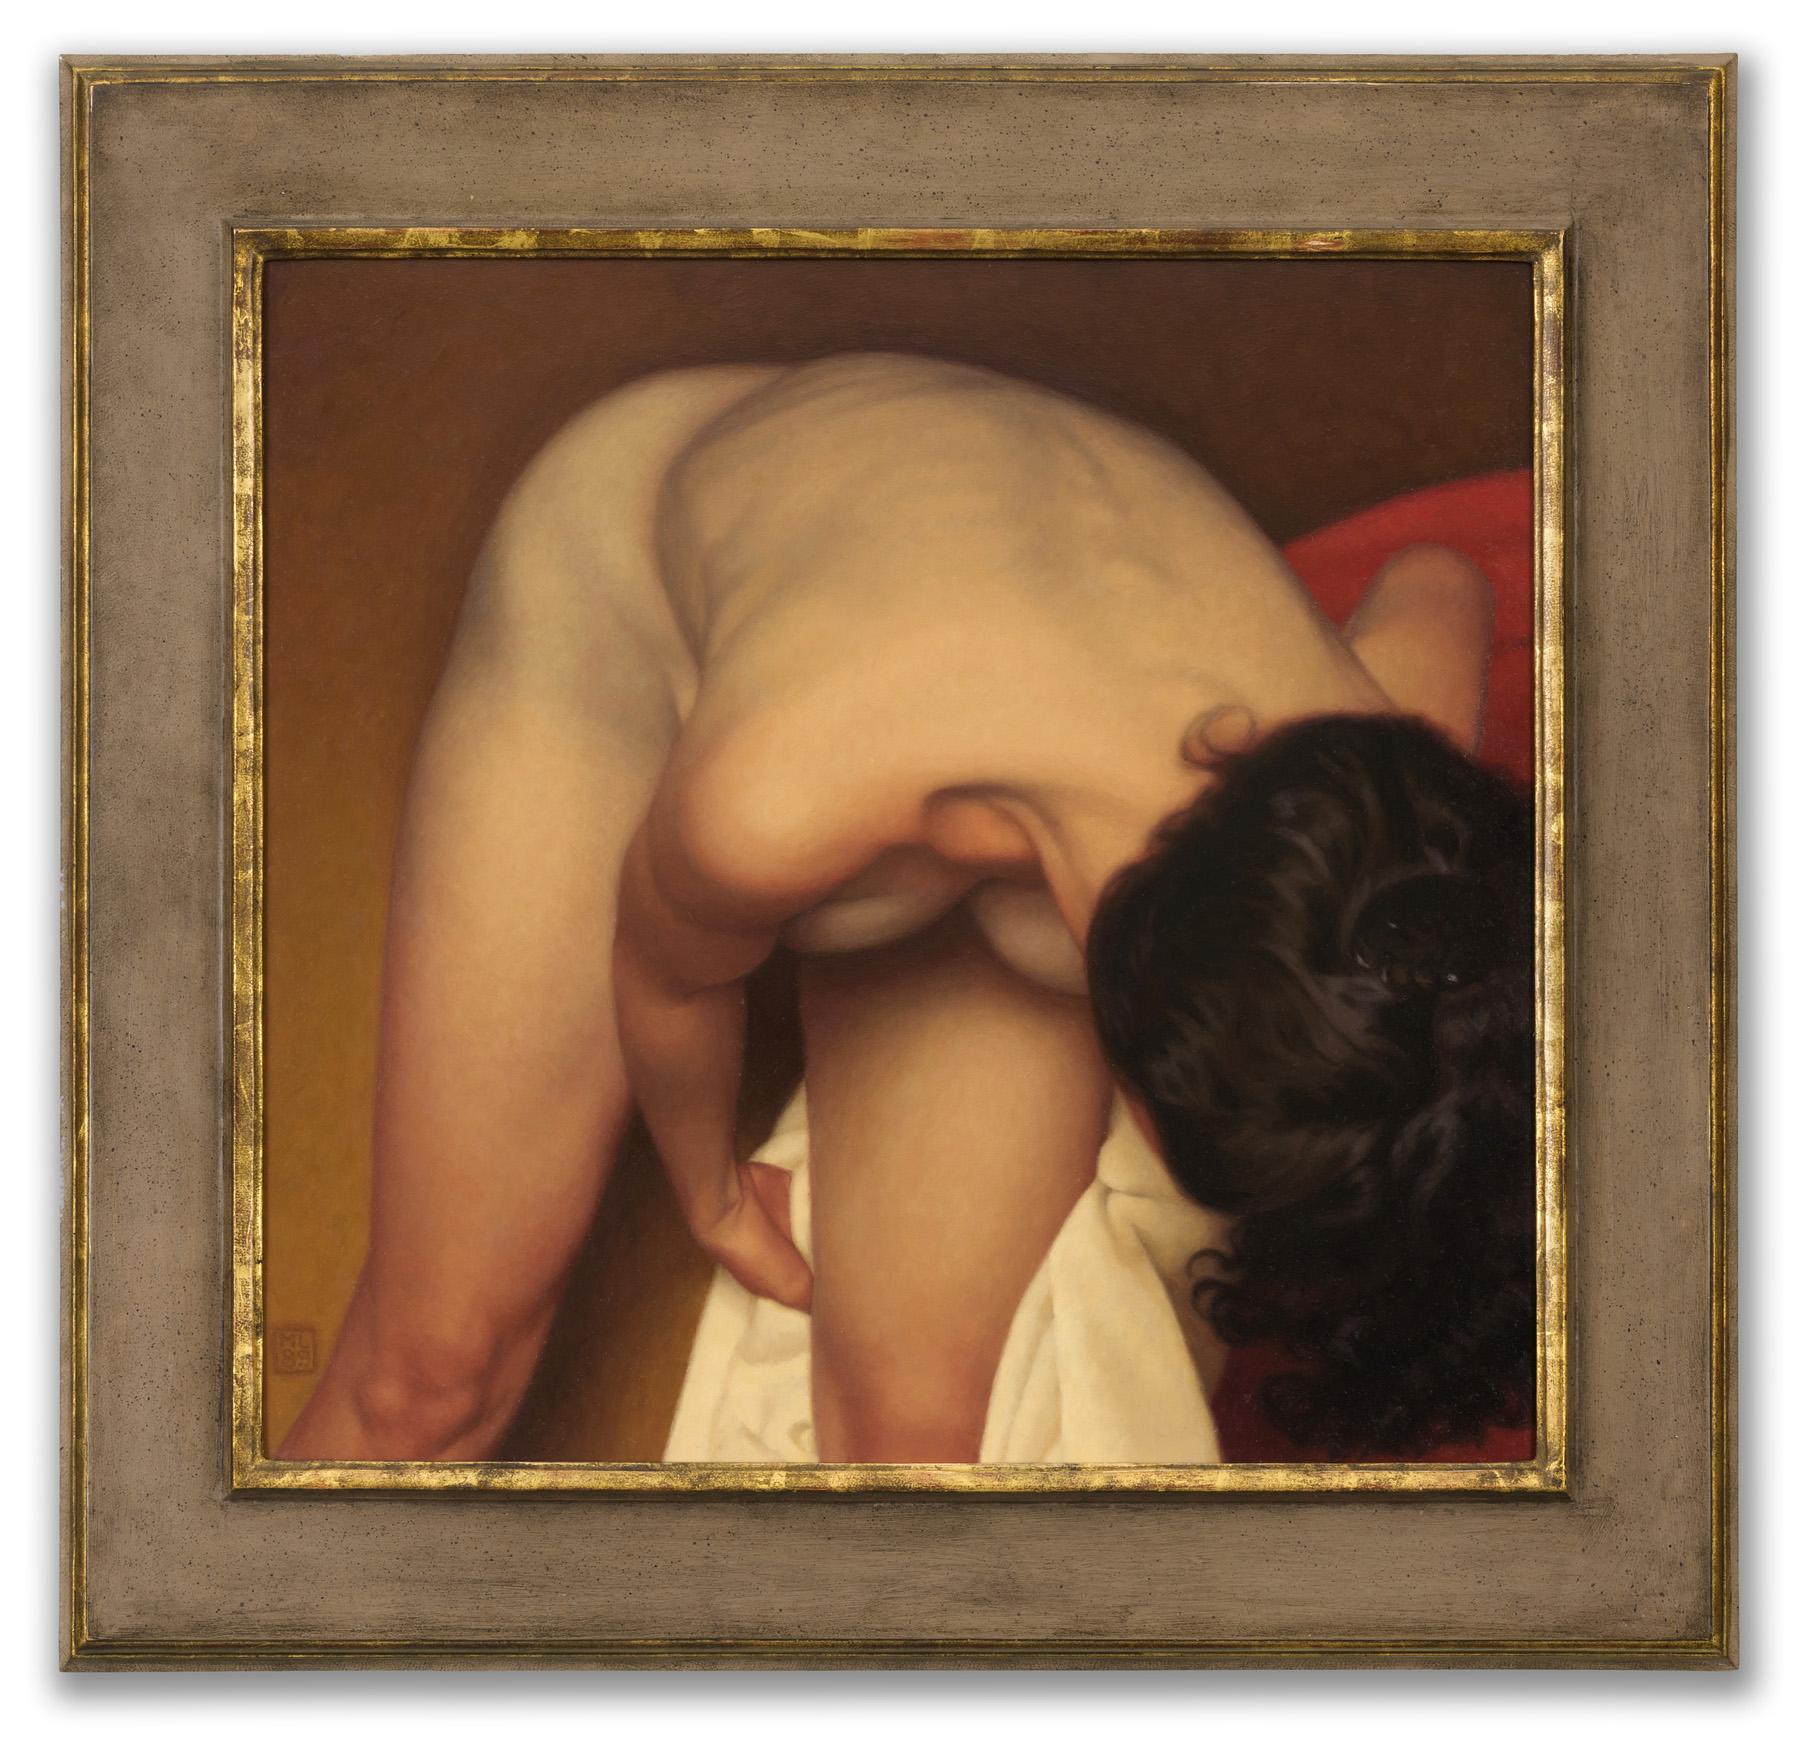 Michael Leonard, (British b.1933), Female Bather on Gold II, 1989.